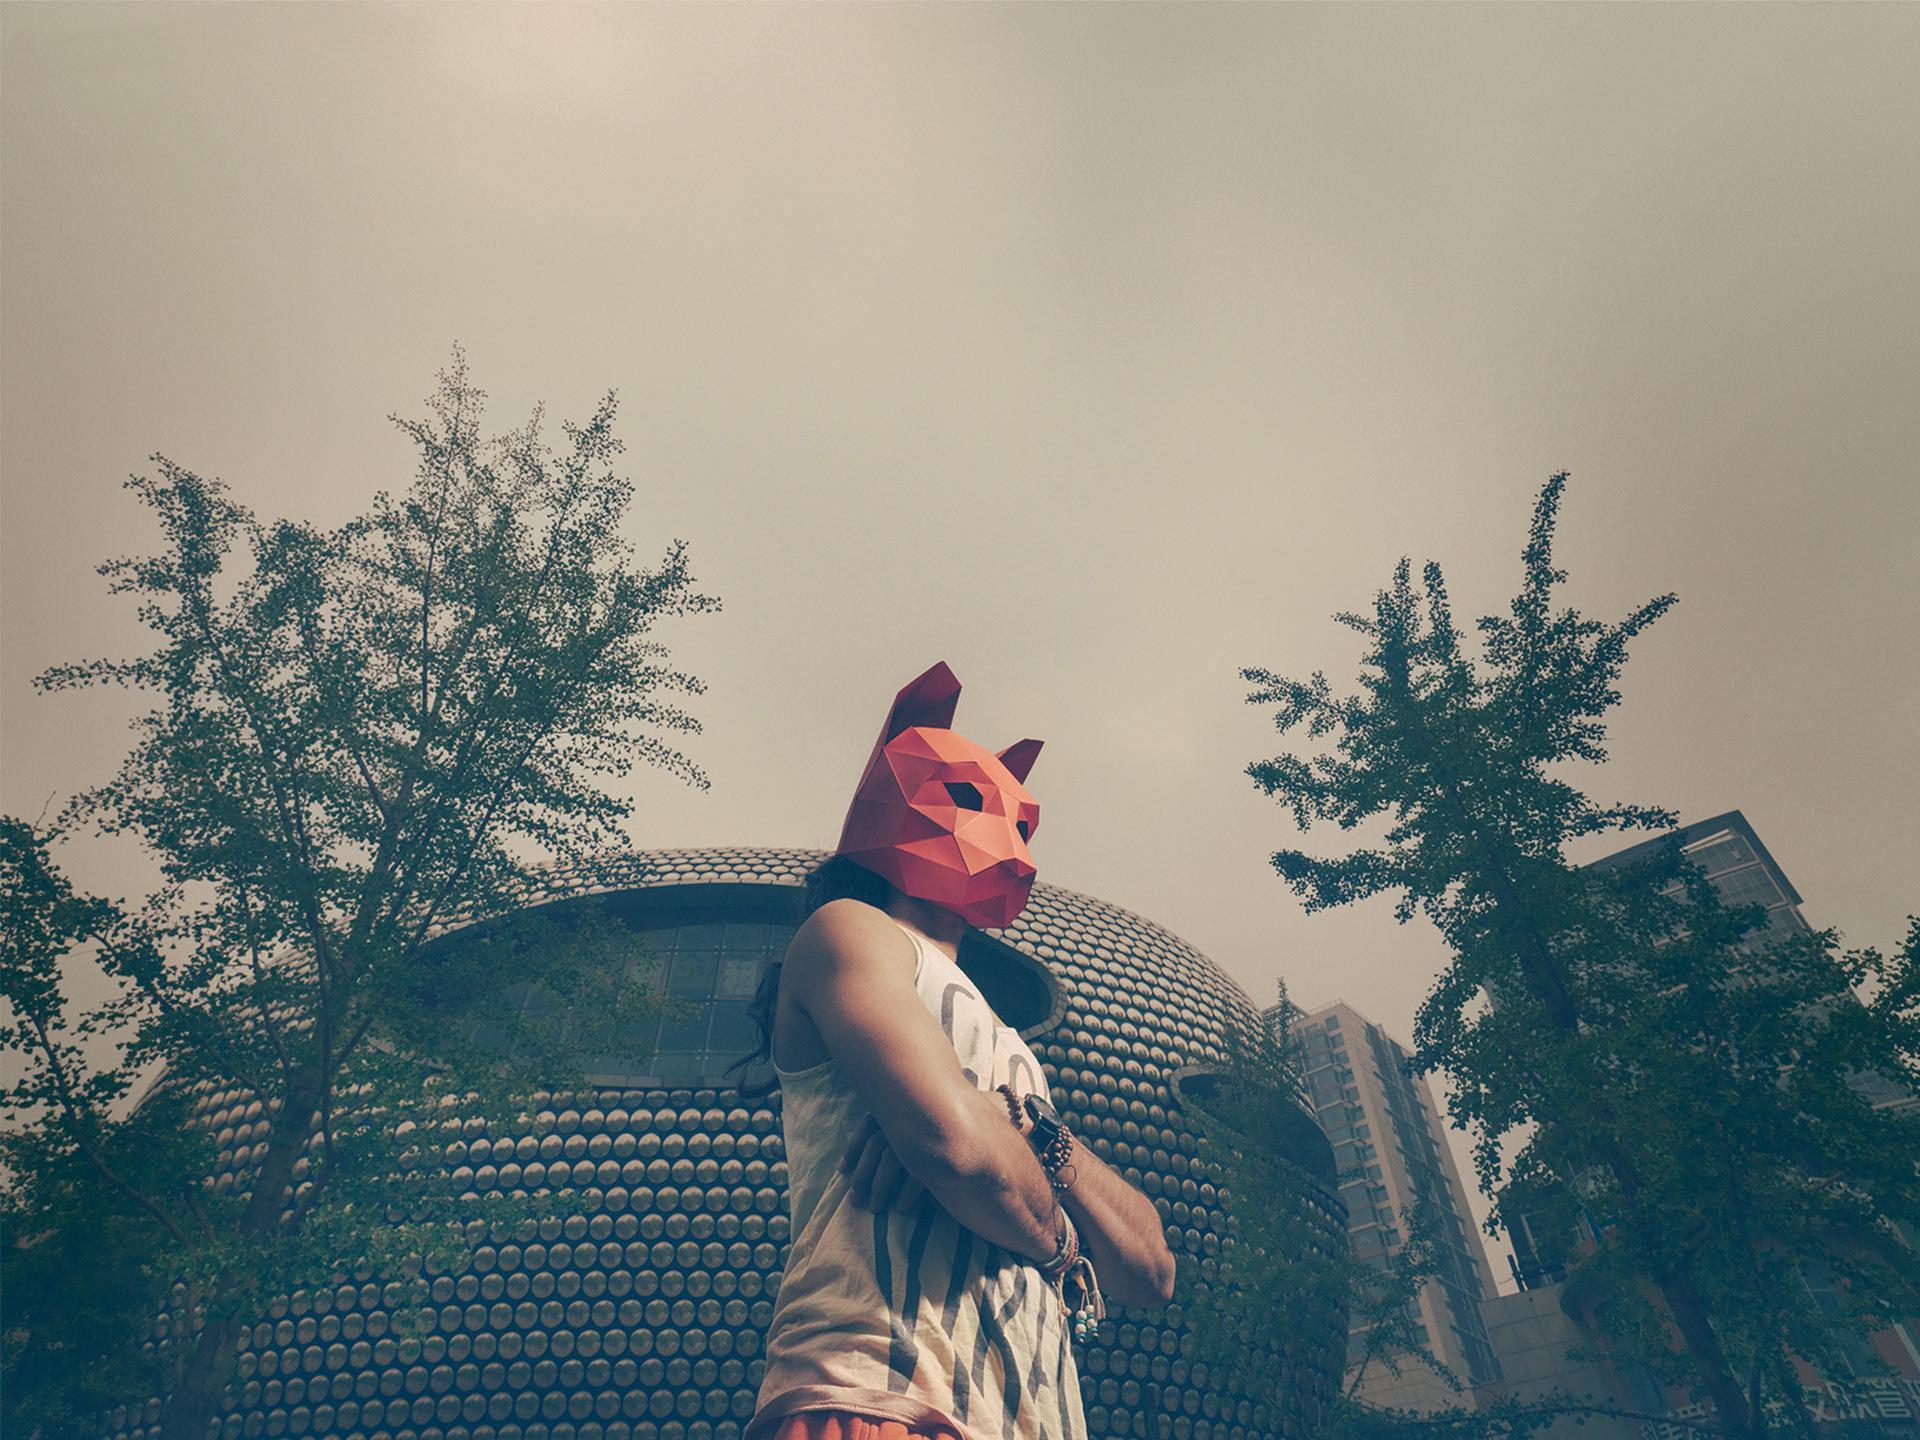 2016, china, beijing, personal work, mask, model: , sonny, mask: wintercroft